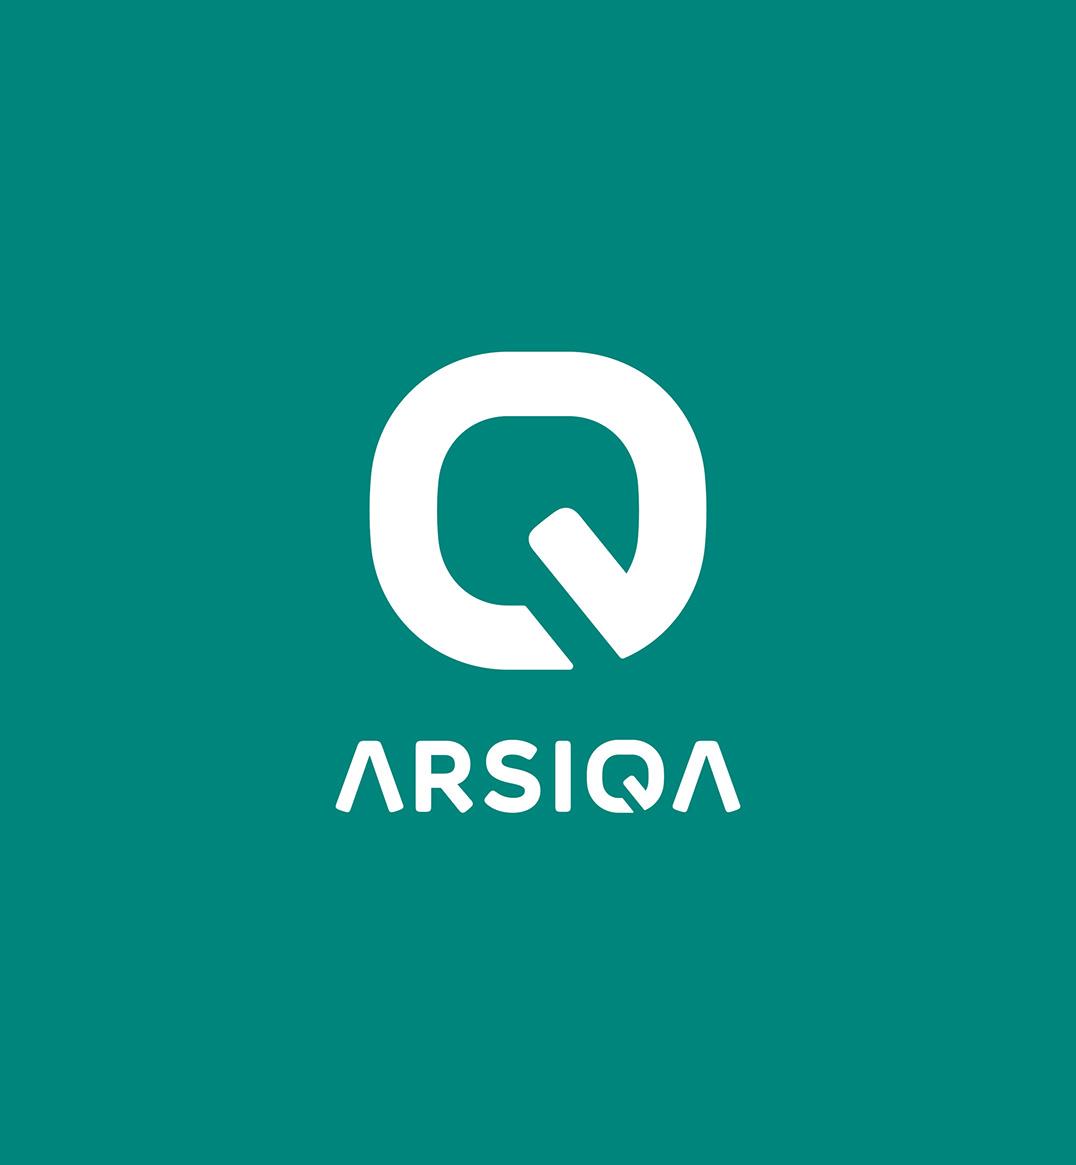 [album/Products_Model_Product/126/ARSIQA_logo_4c_inv.jpg]